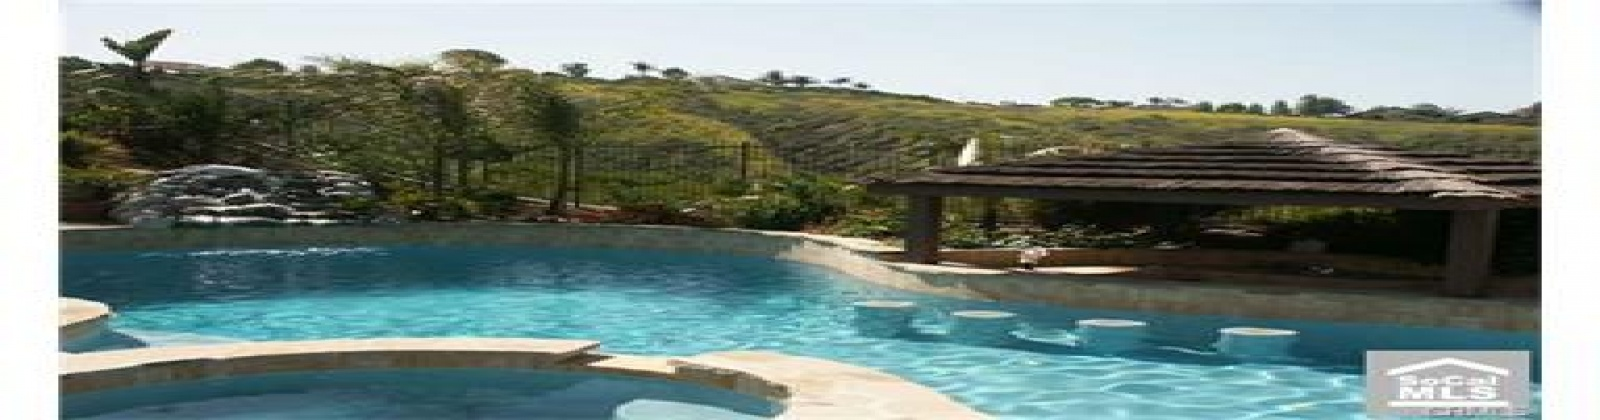 4118 Costero Risco, San Clemente, California 92673, 5 Bedrooms Bedrooms, ,Home,Sold,Costero Risco,1004